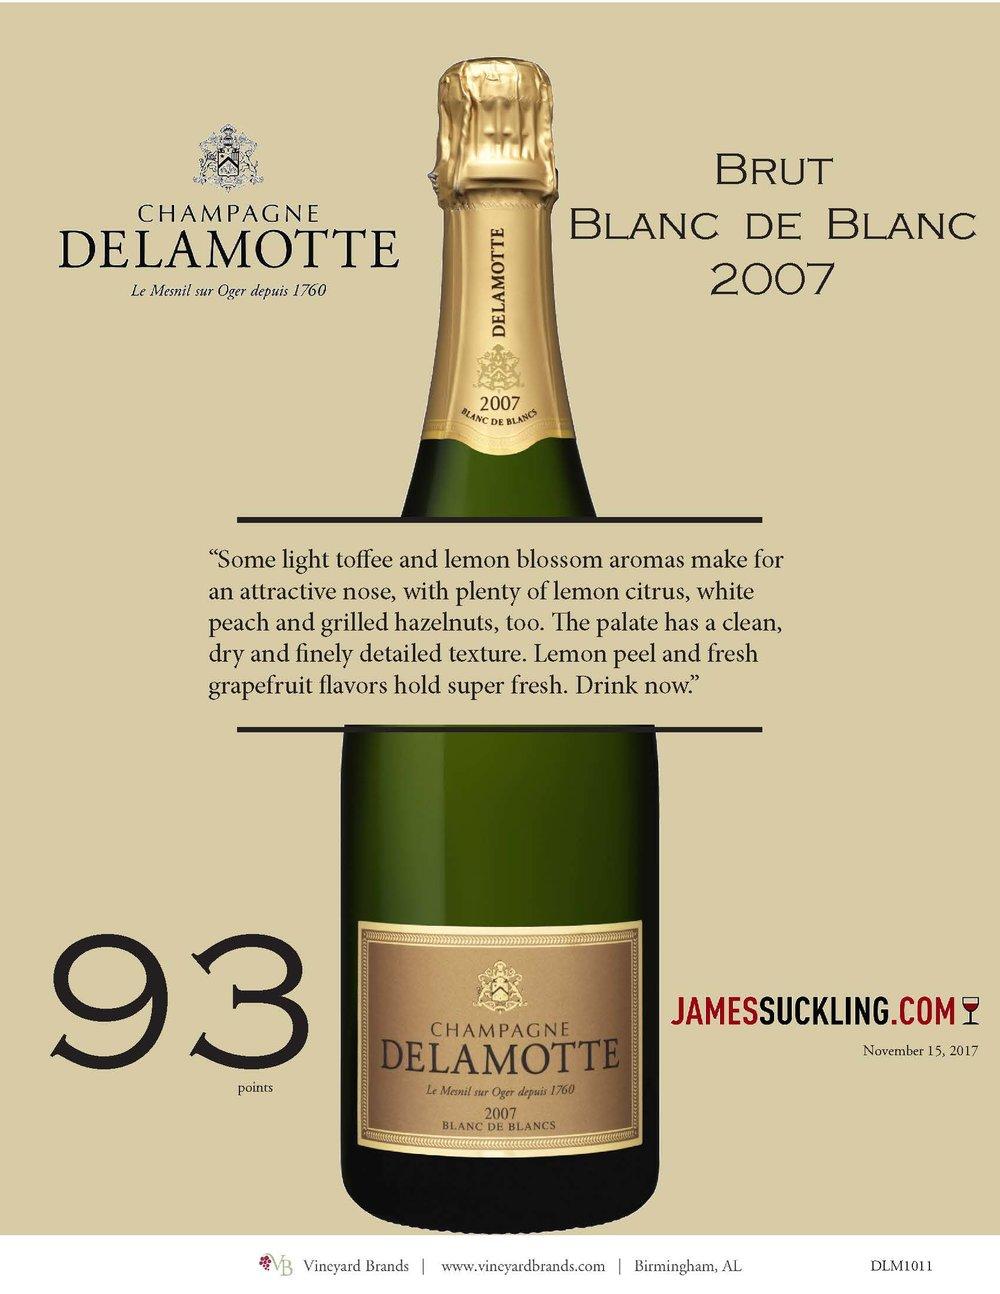 Champagne Delamotte Blanc de Blancs 2007.jpg